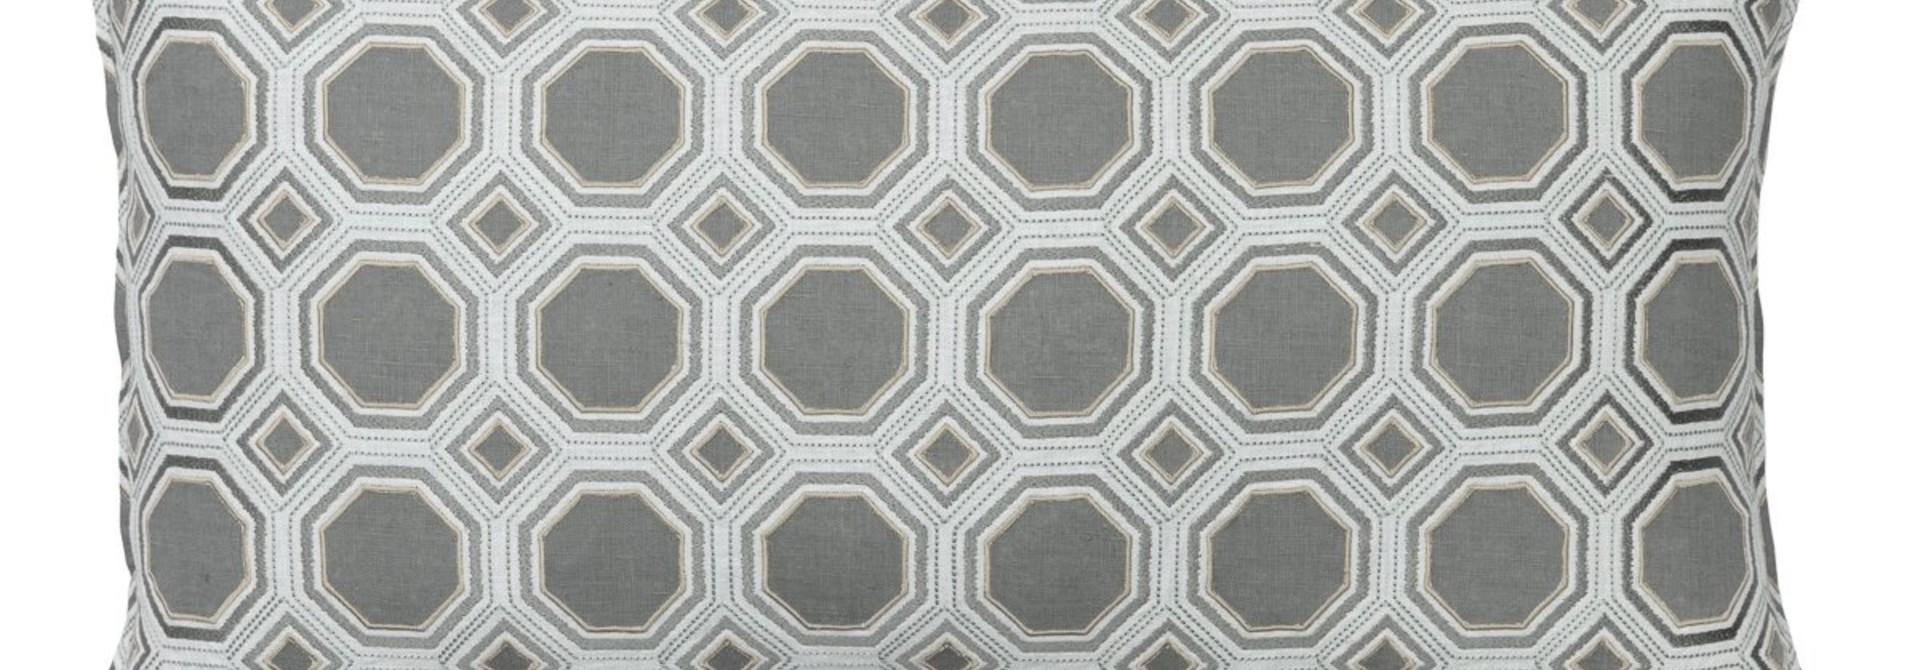 Honeycomb Appliqué Ivory Cushion